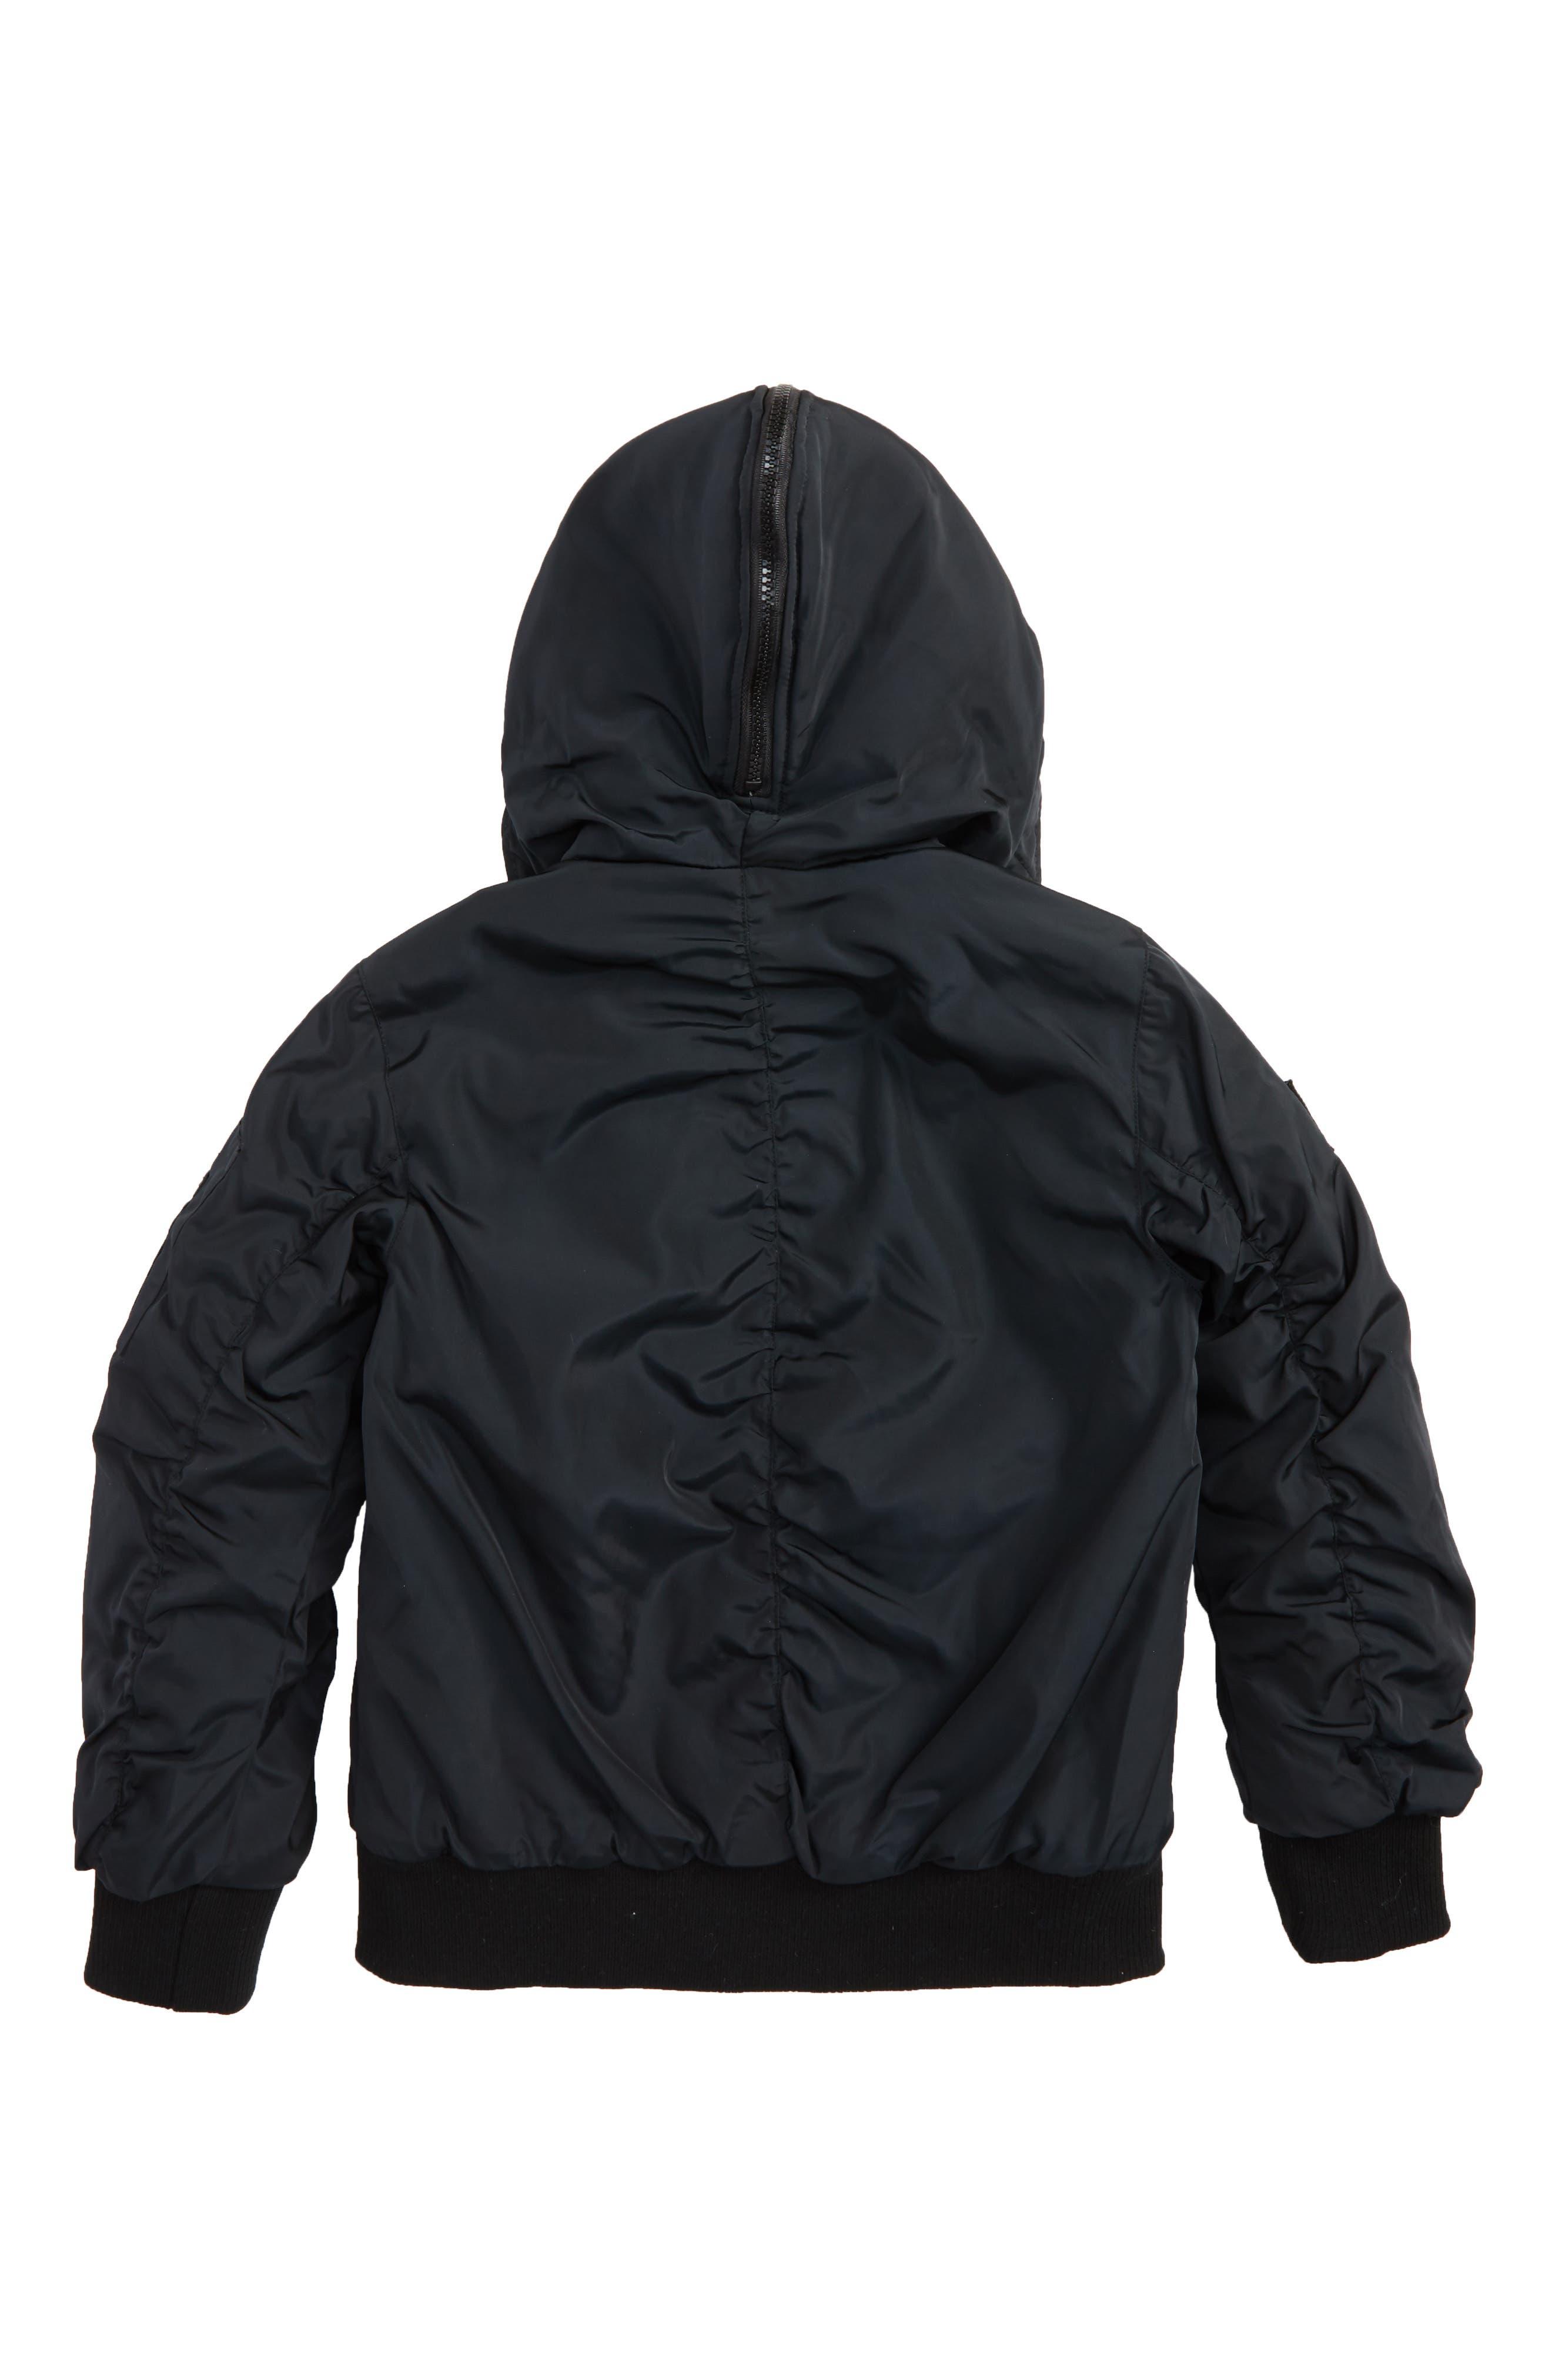 Hooded Bomber Jacket,                             Alternate thumbnail 2, color,                             001